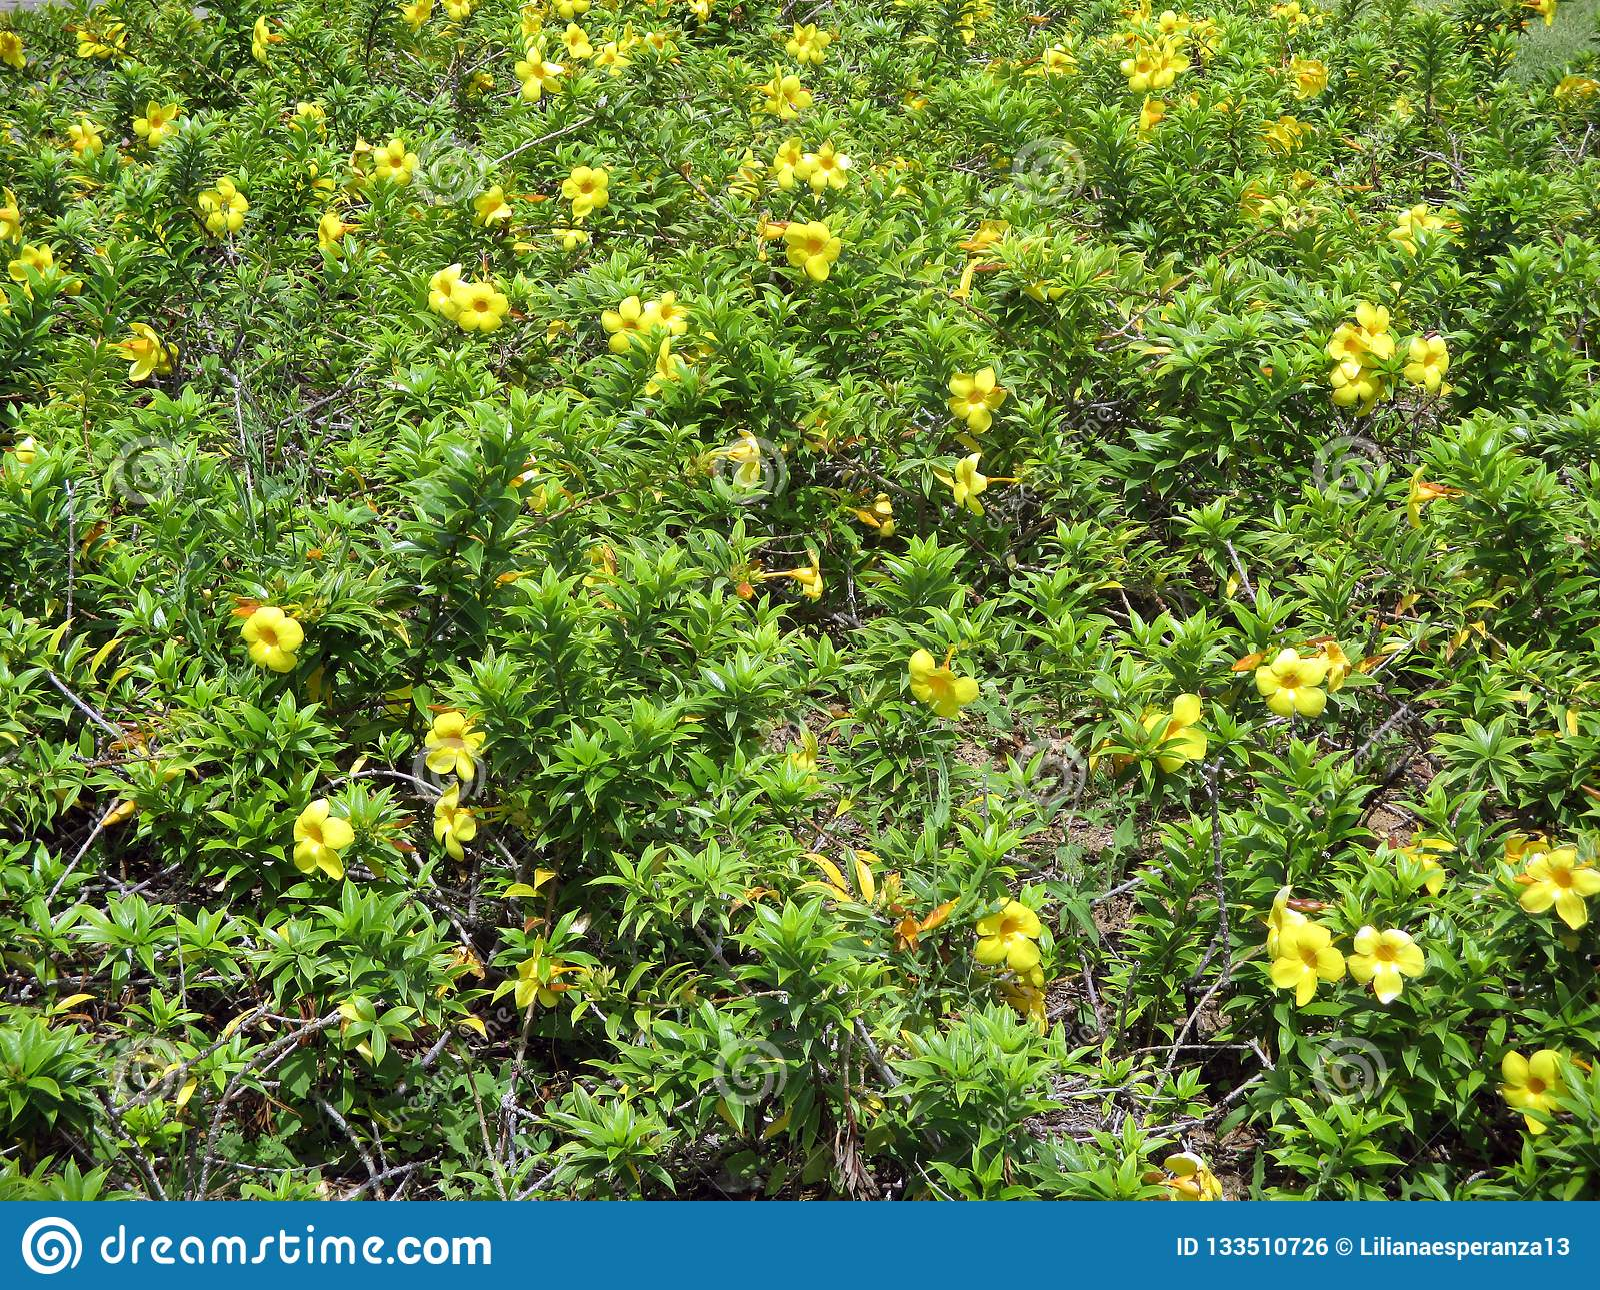 Fiori Gialli Rampicanti.Alamanda Or Gold Cup Climbing Plant With Yellow Flowers Stock